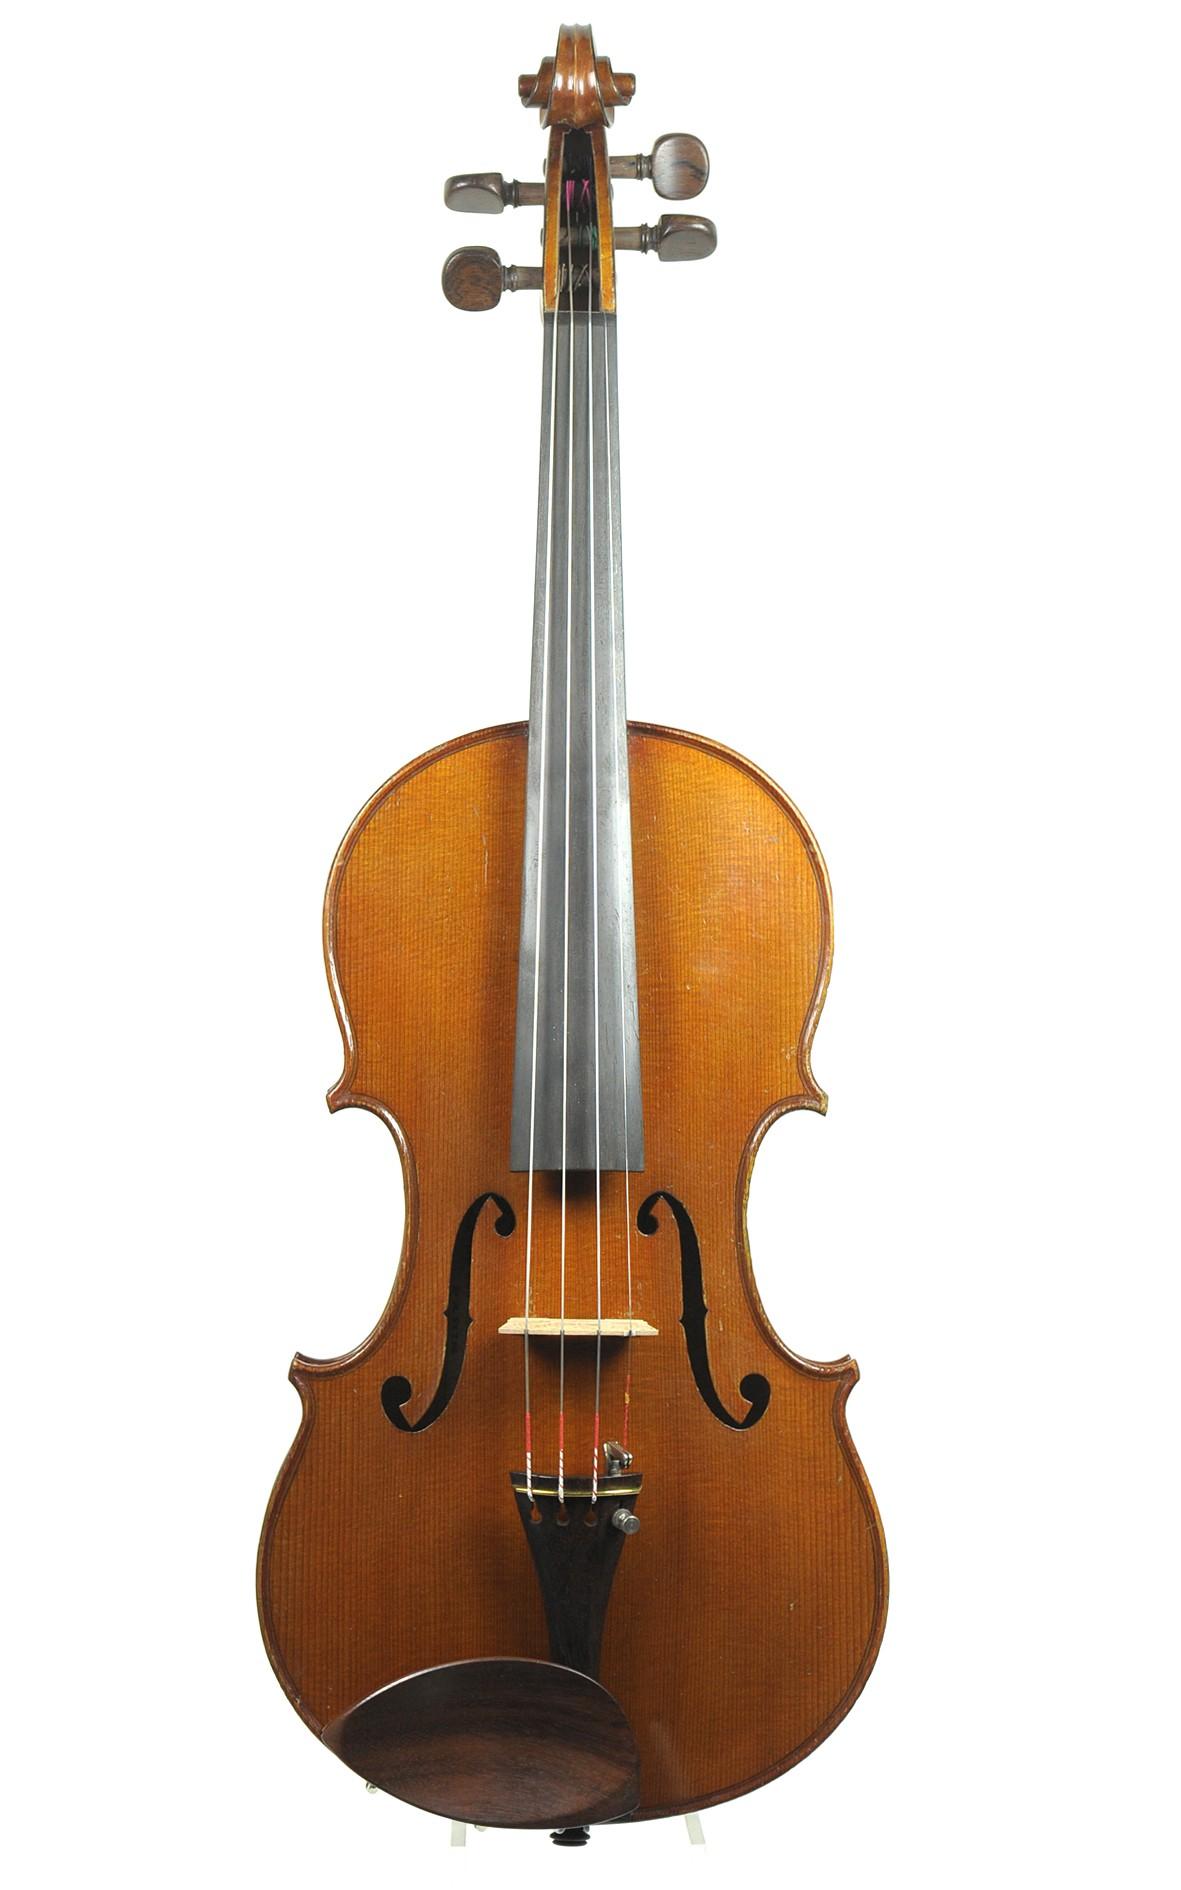 Antique French violin, c.1920, probably Laberte